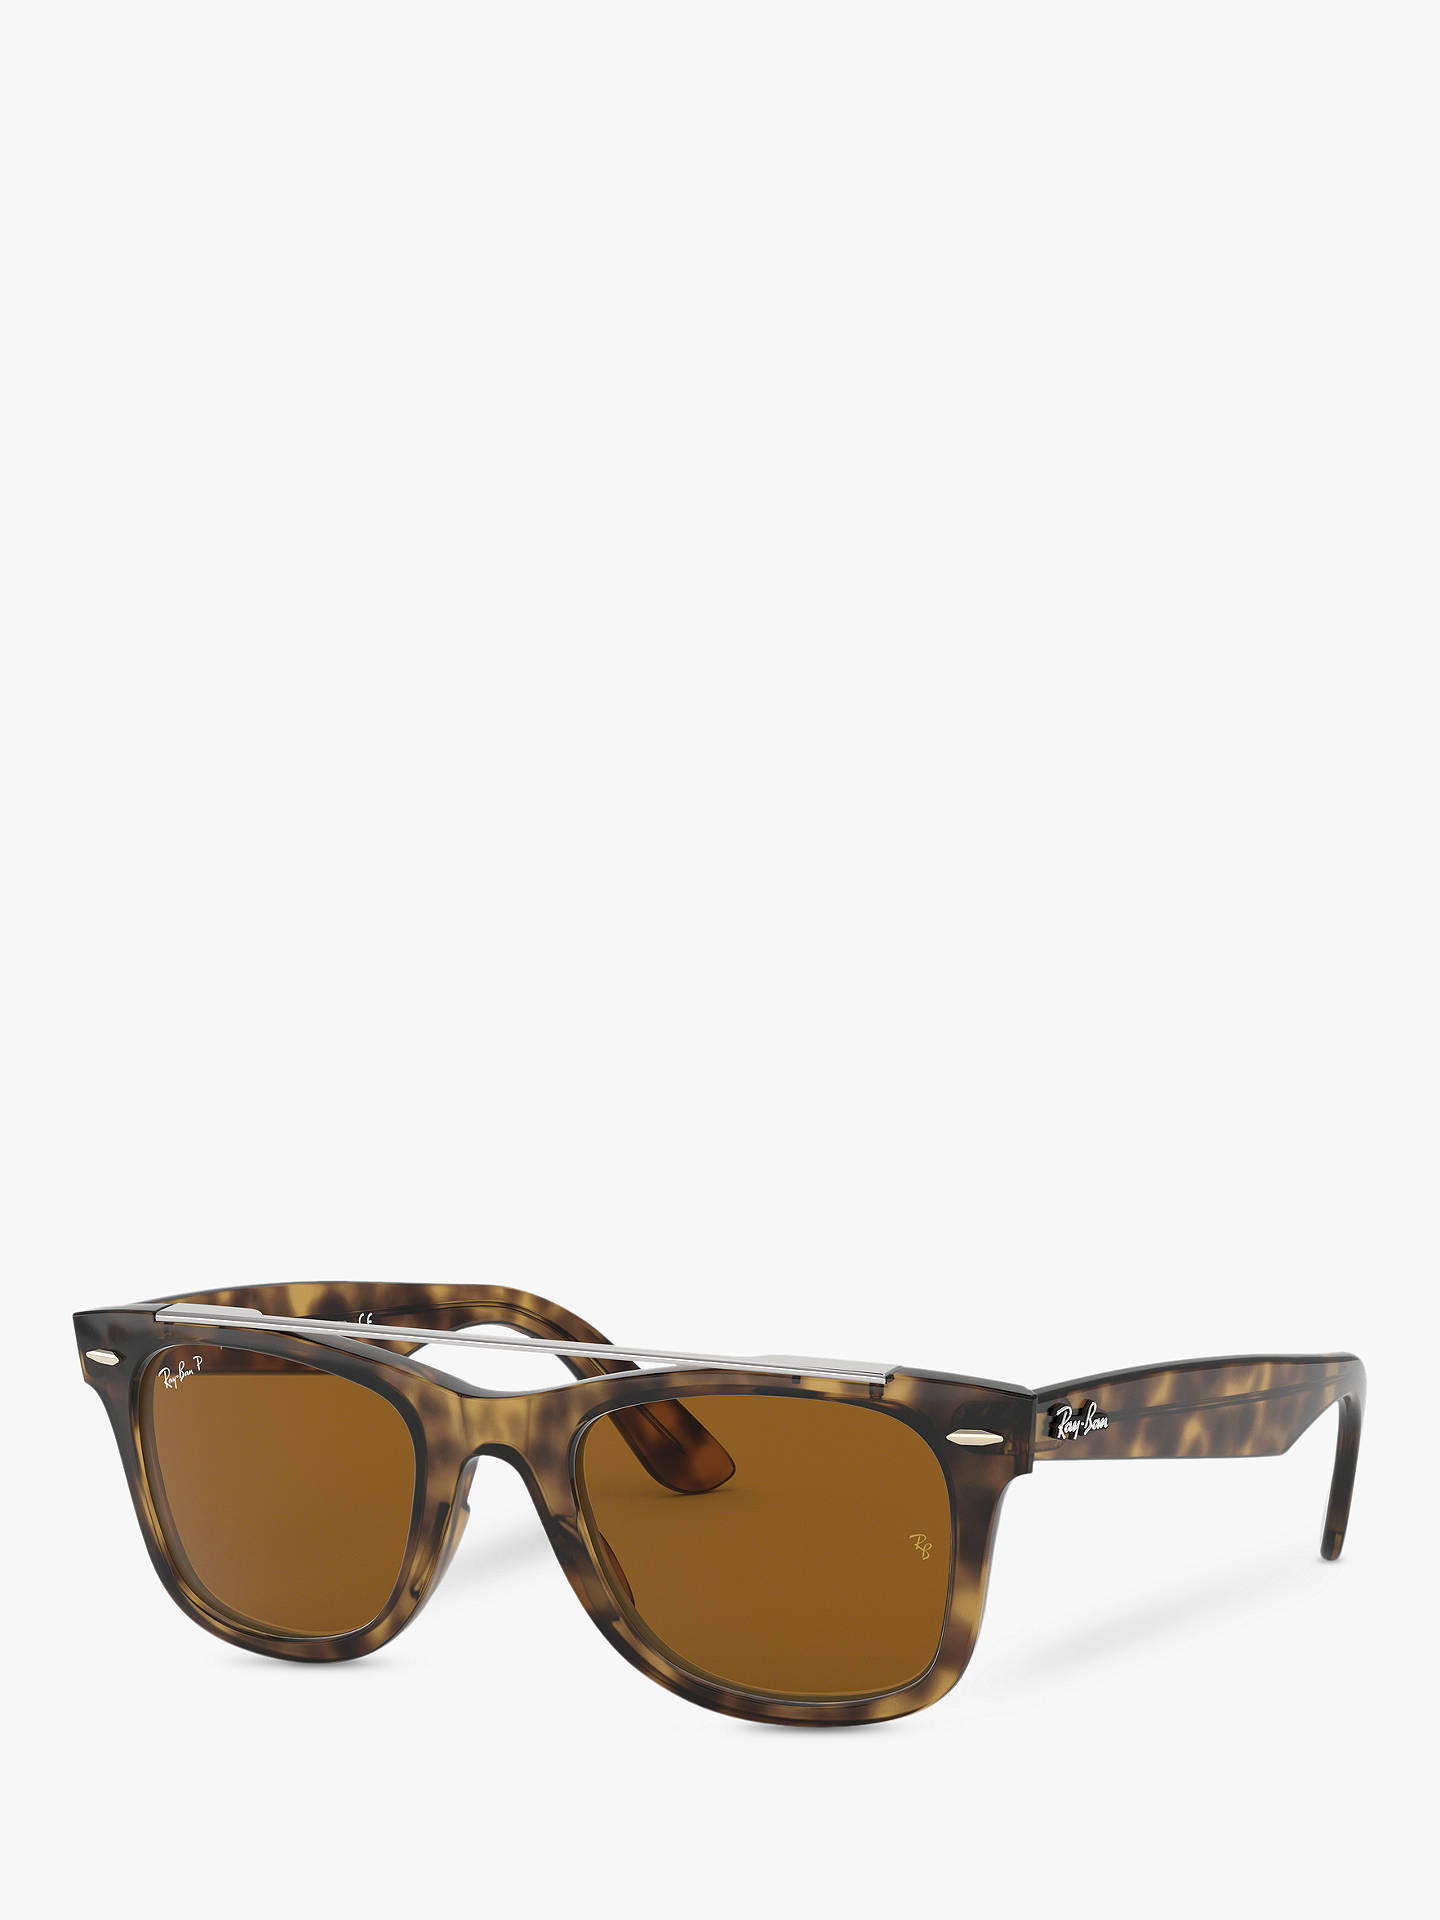 0d6faf83f0 Ray-Ban RB4540 Women s Polarised Wayfarer Double Bridge Sunglasses ...